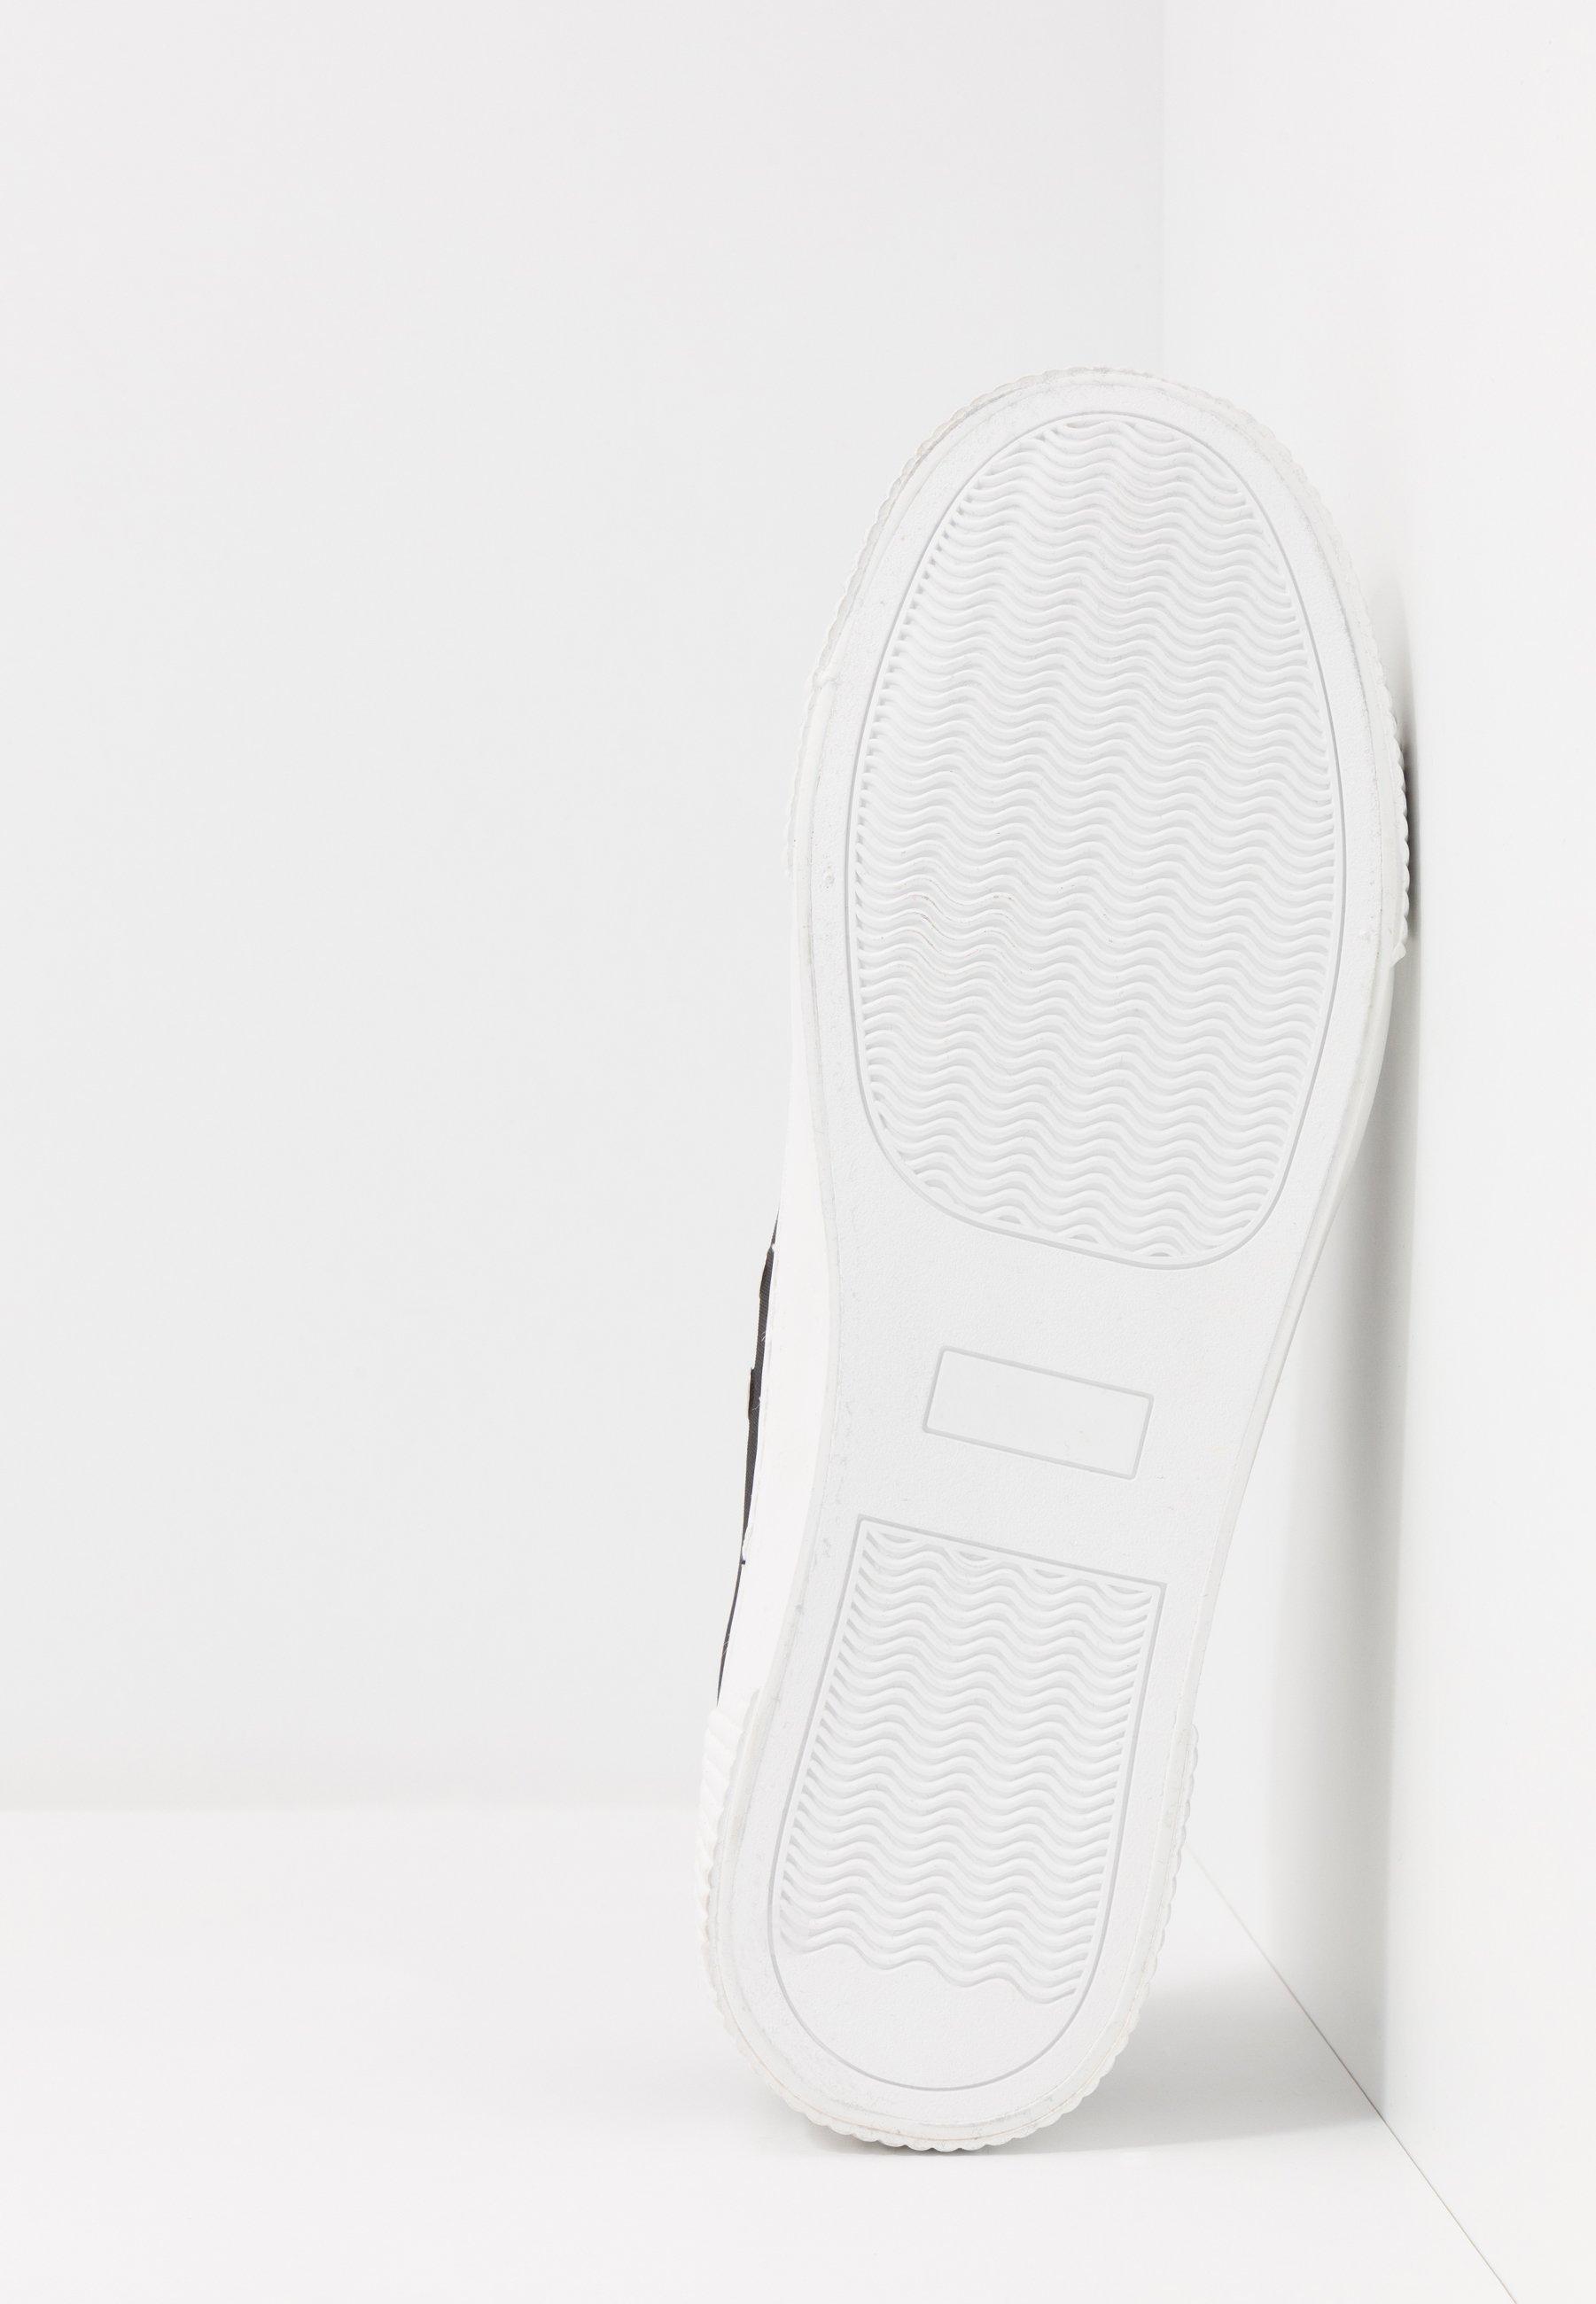 Cotton On LACCA RETRO SKATE SHOE - Sneakers - black/white